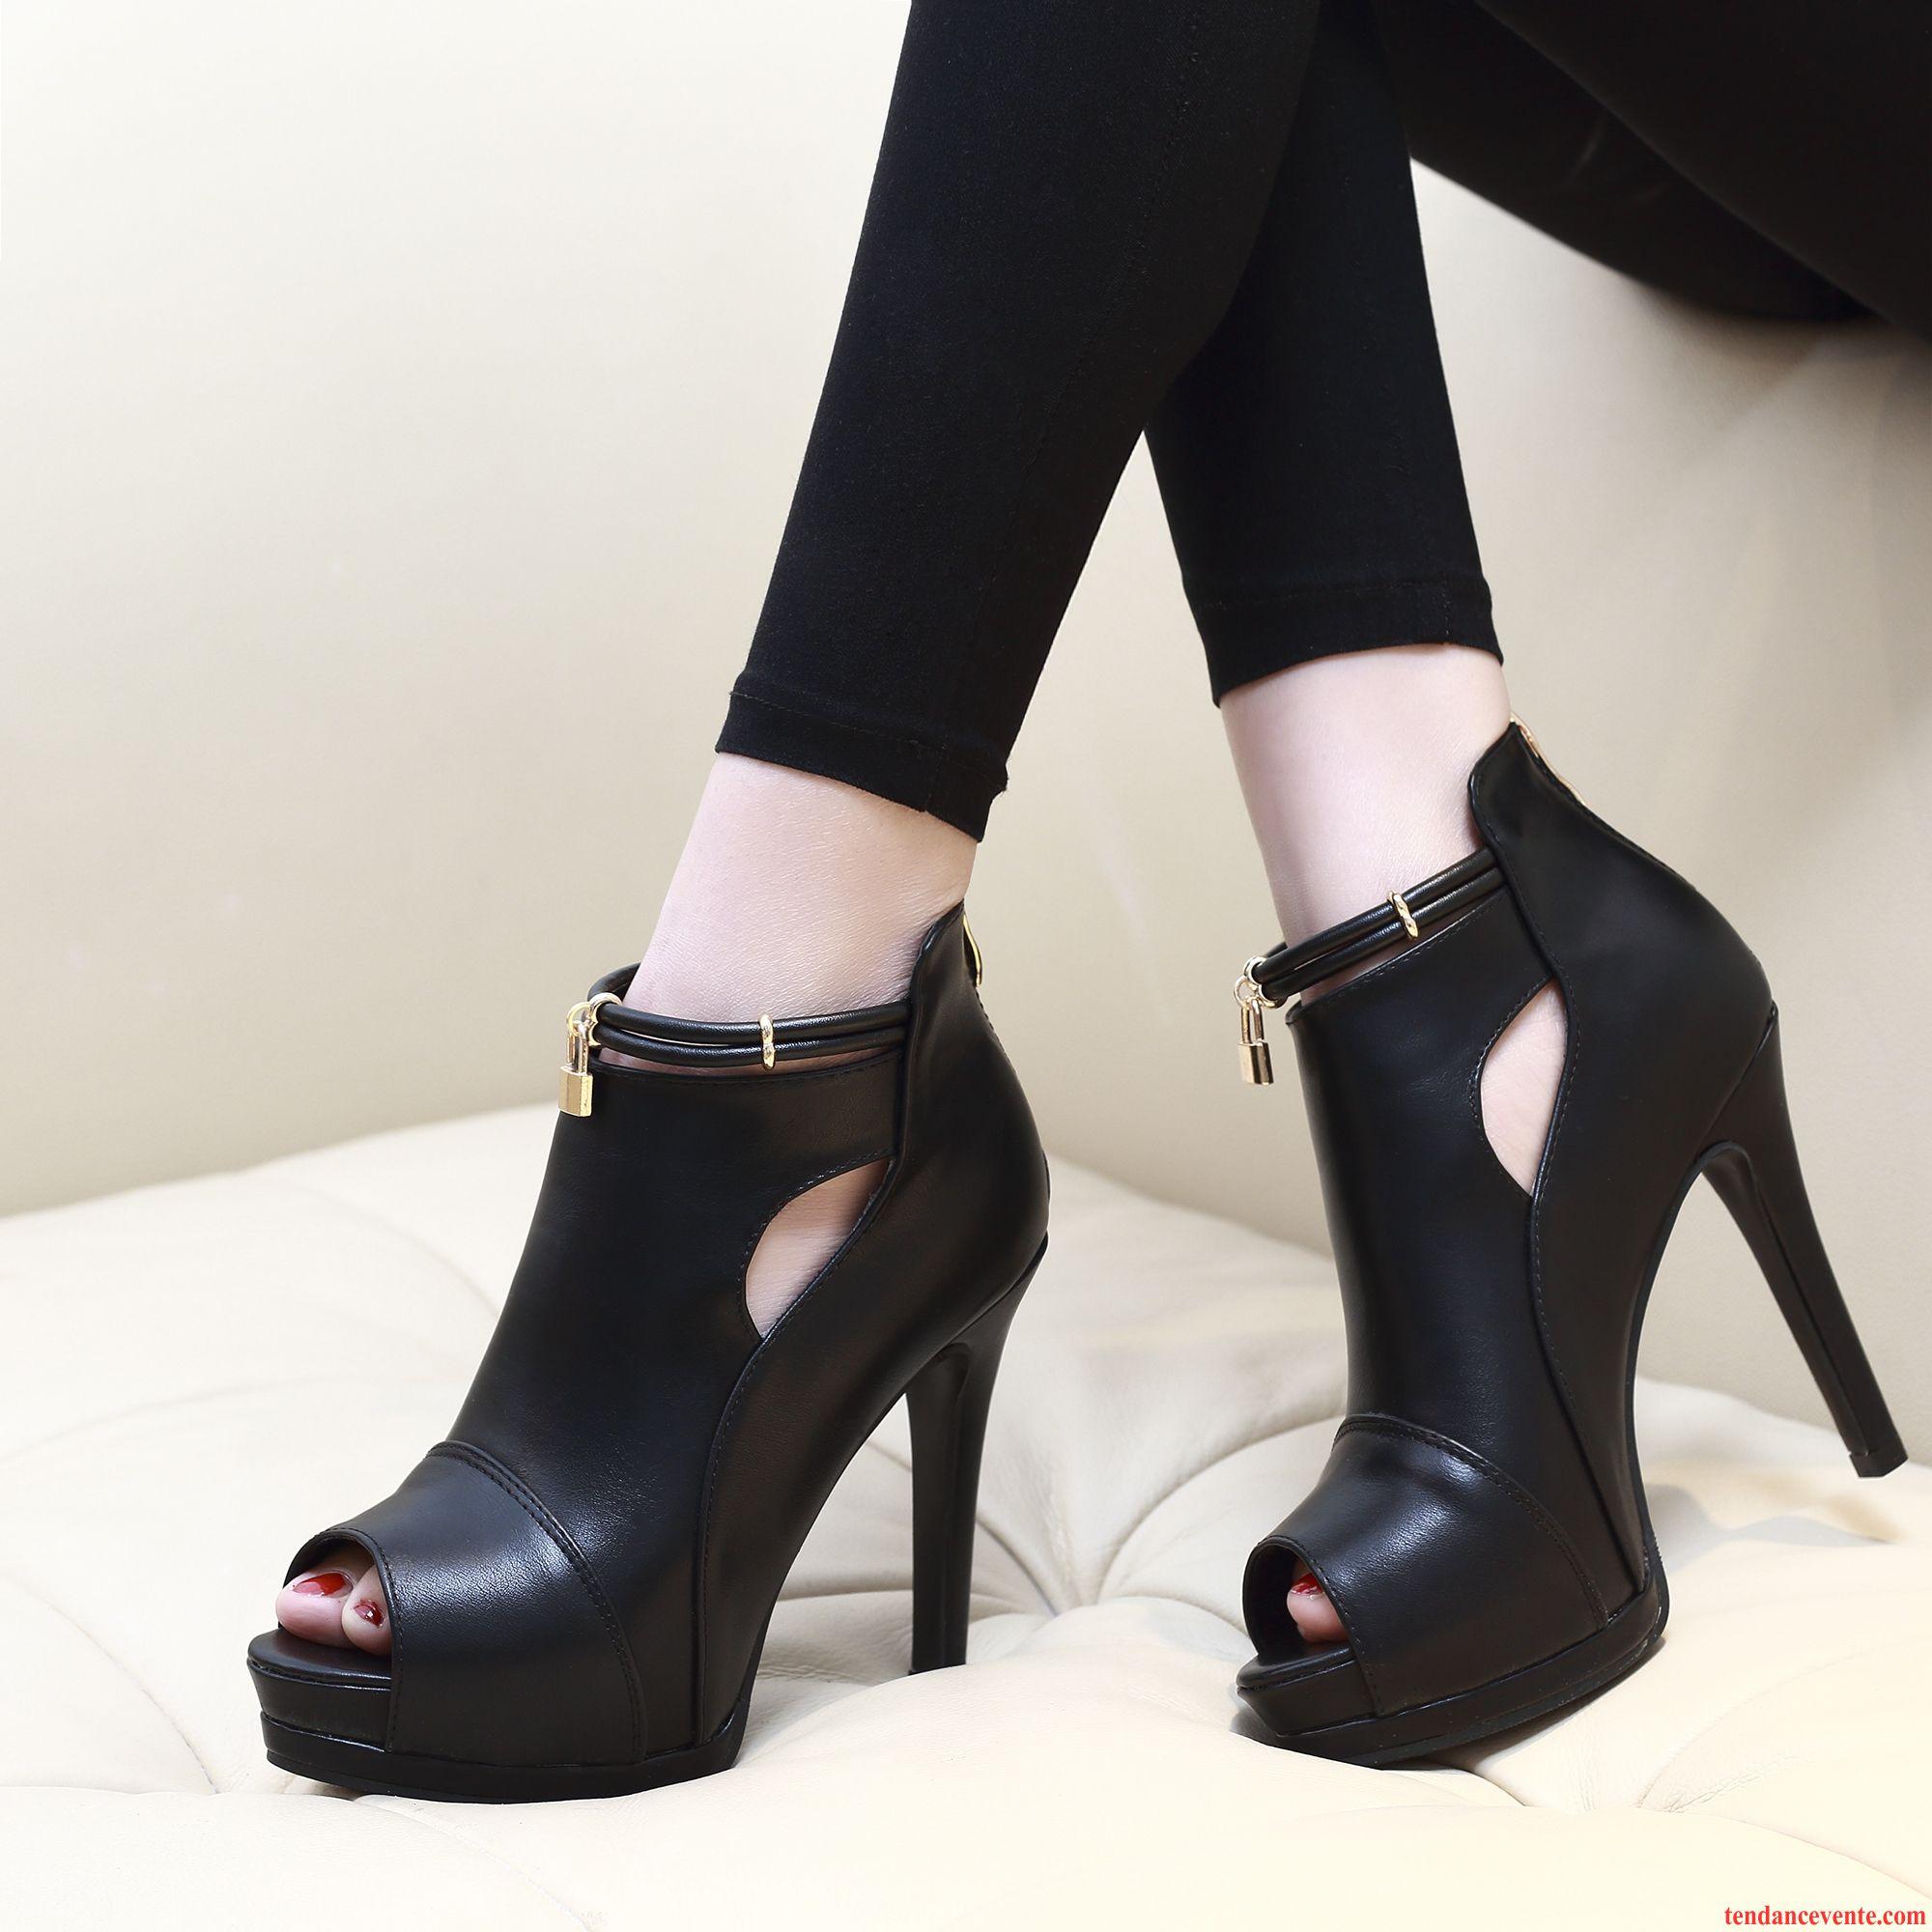 Chaussures noires Sexy femme QFrmXku6